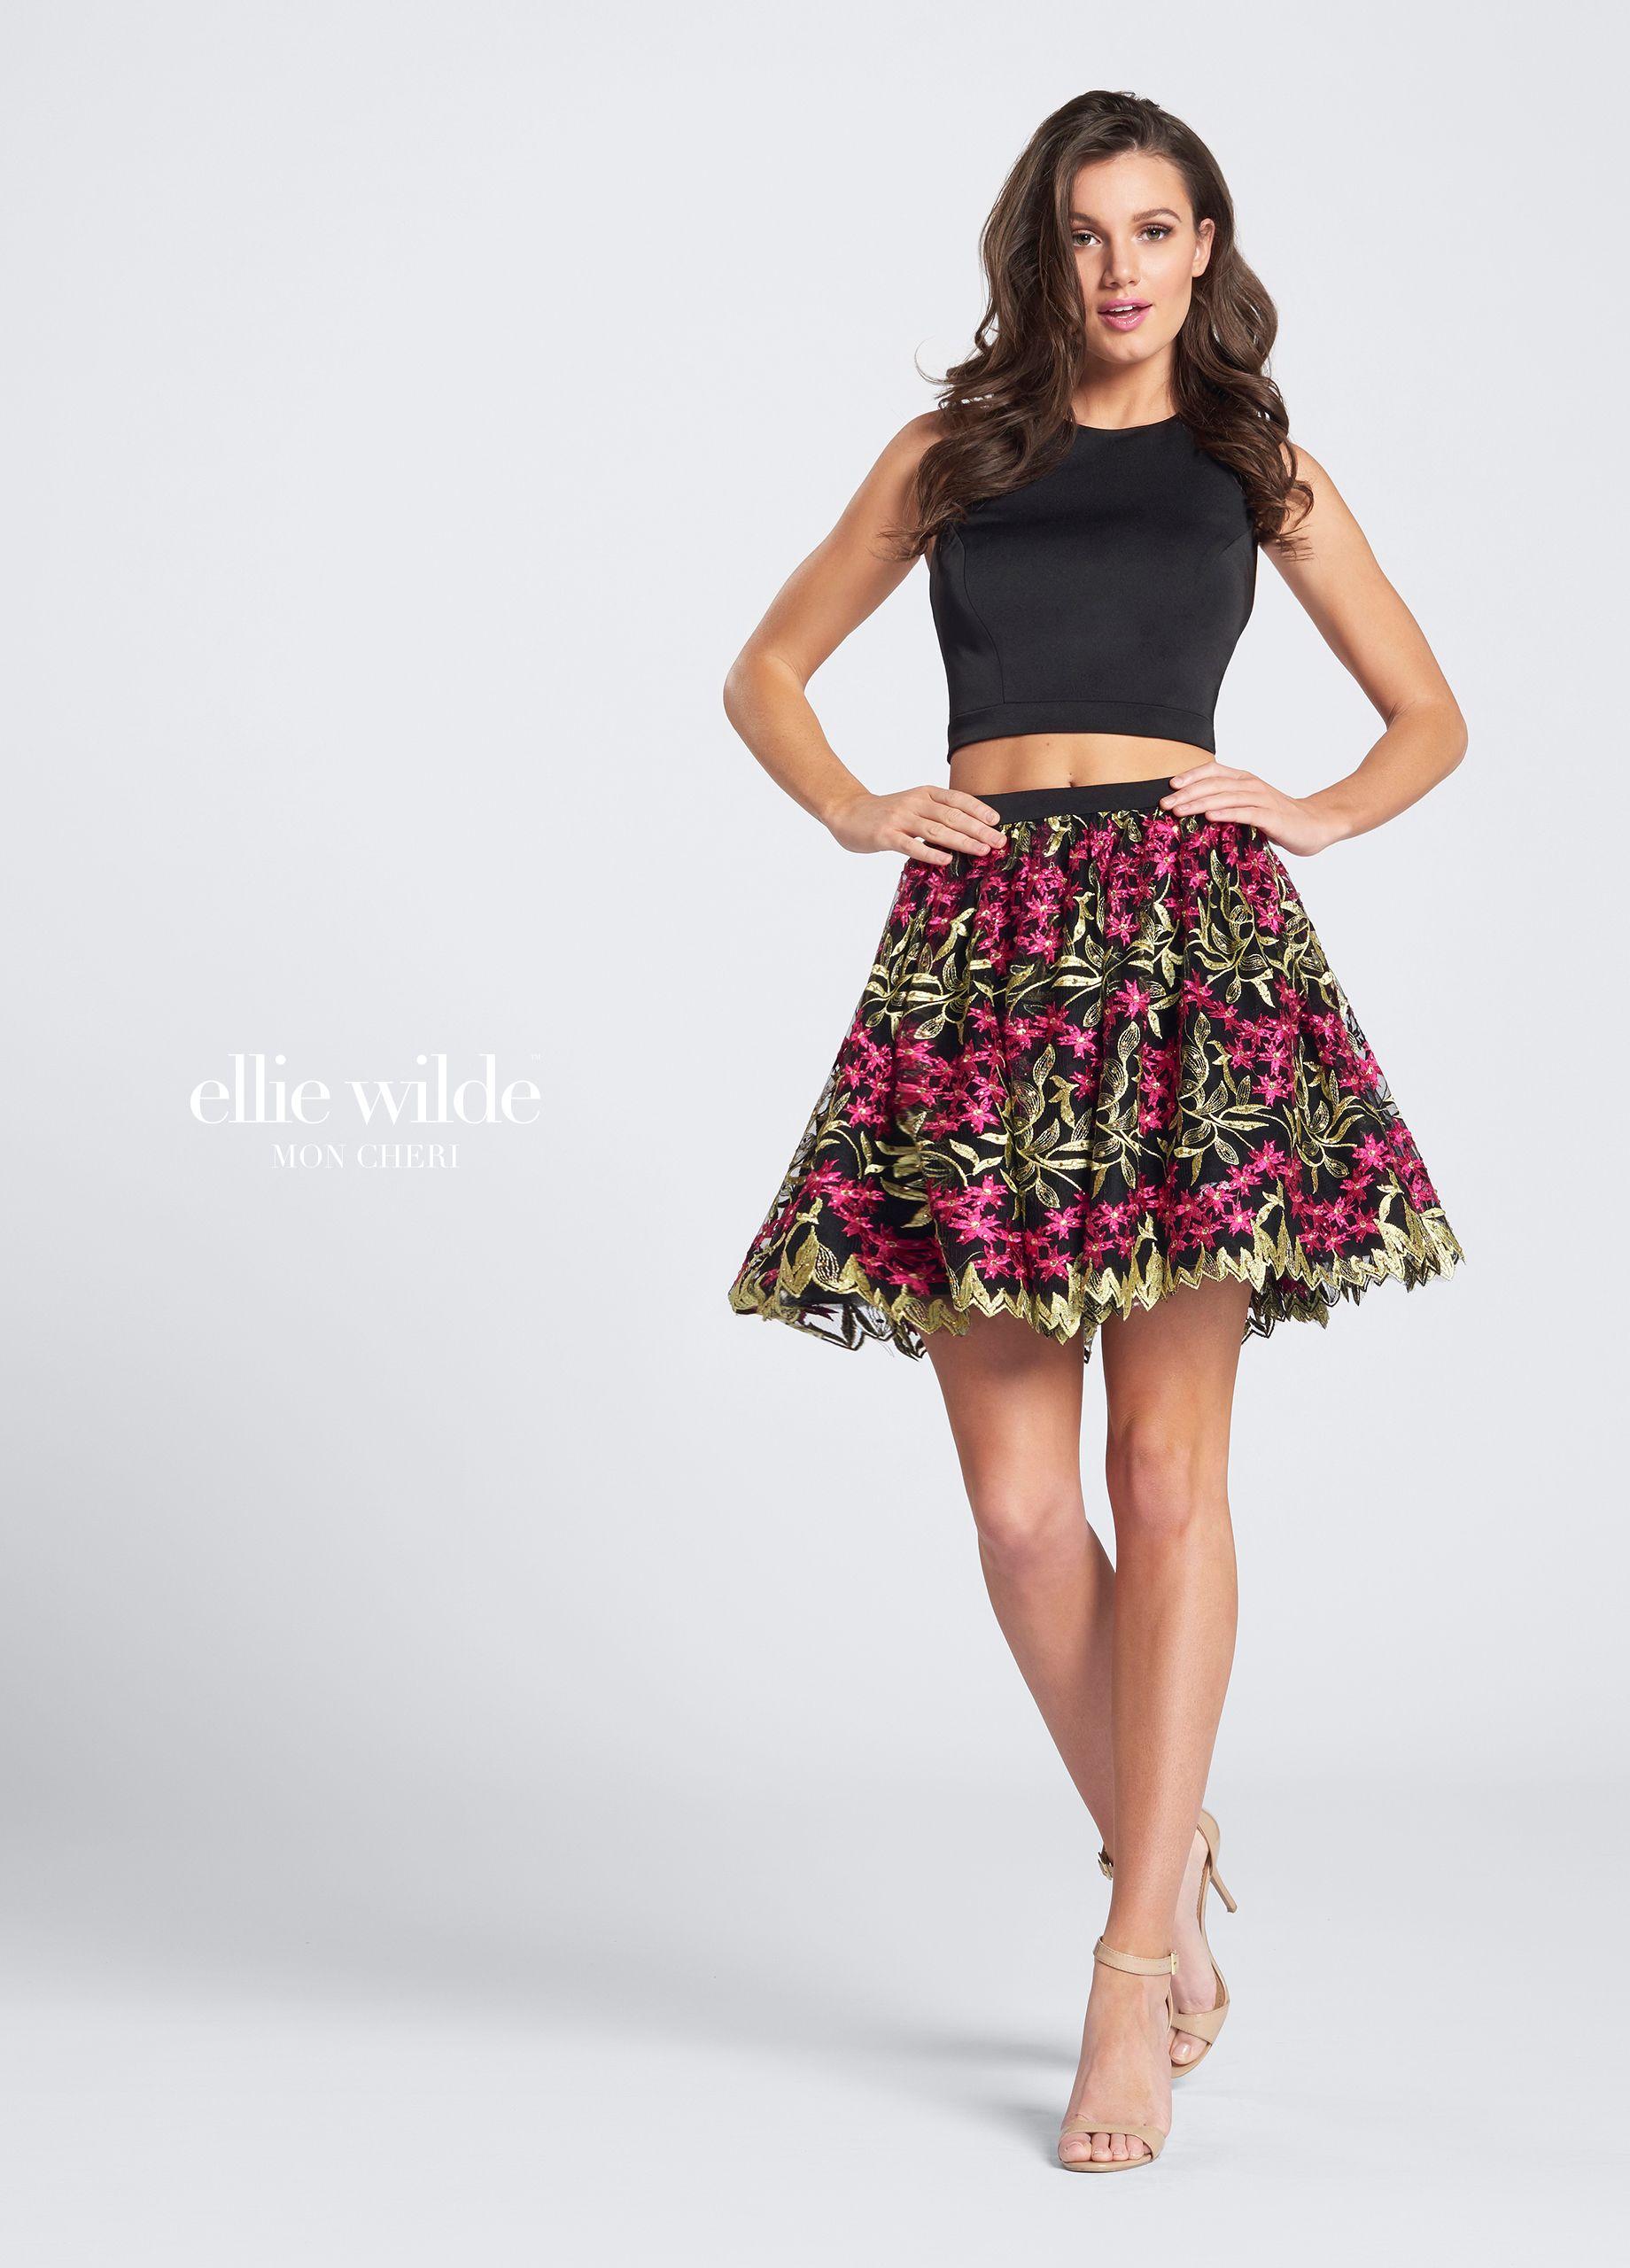 Twopiece short open back homecoming dress ellie wilde ews